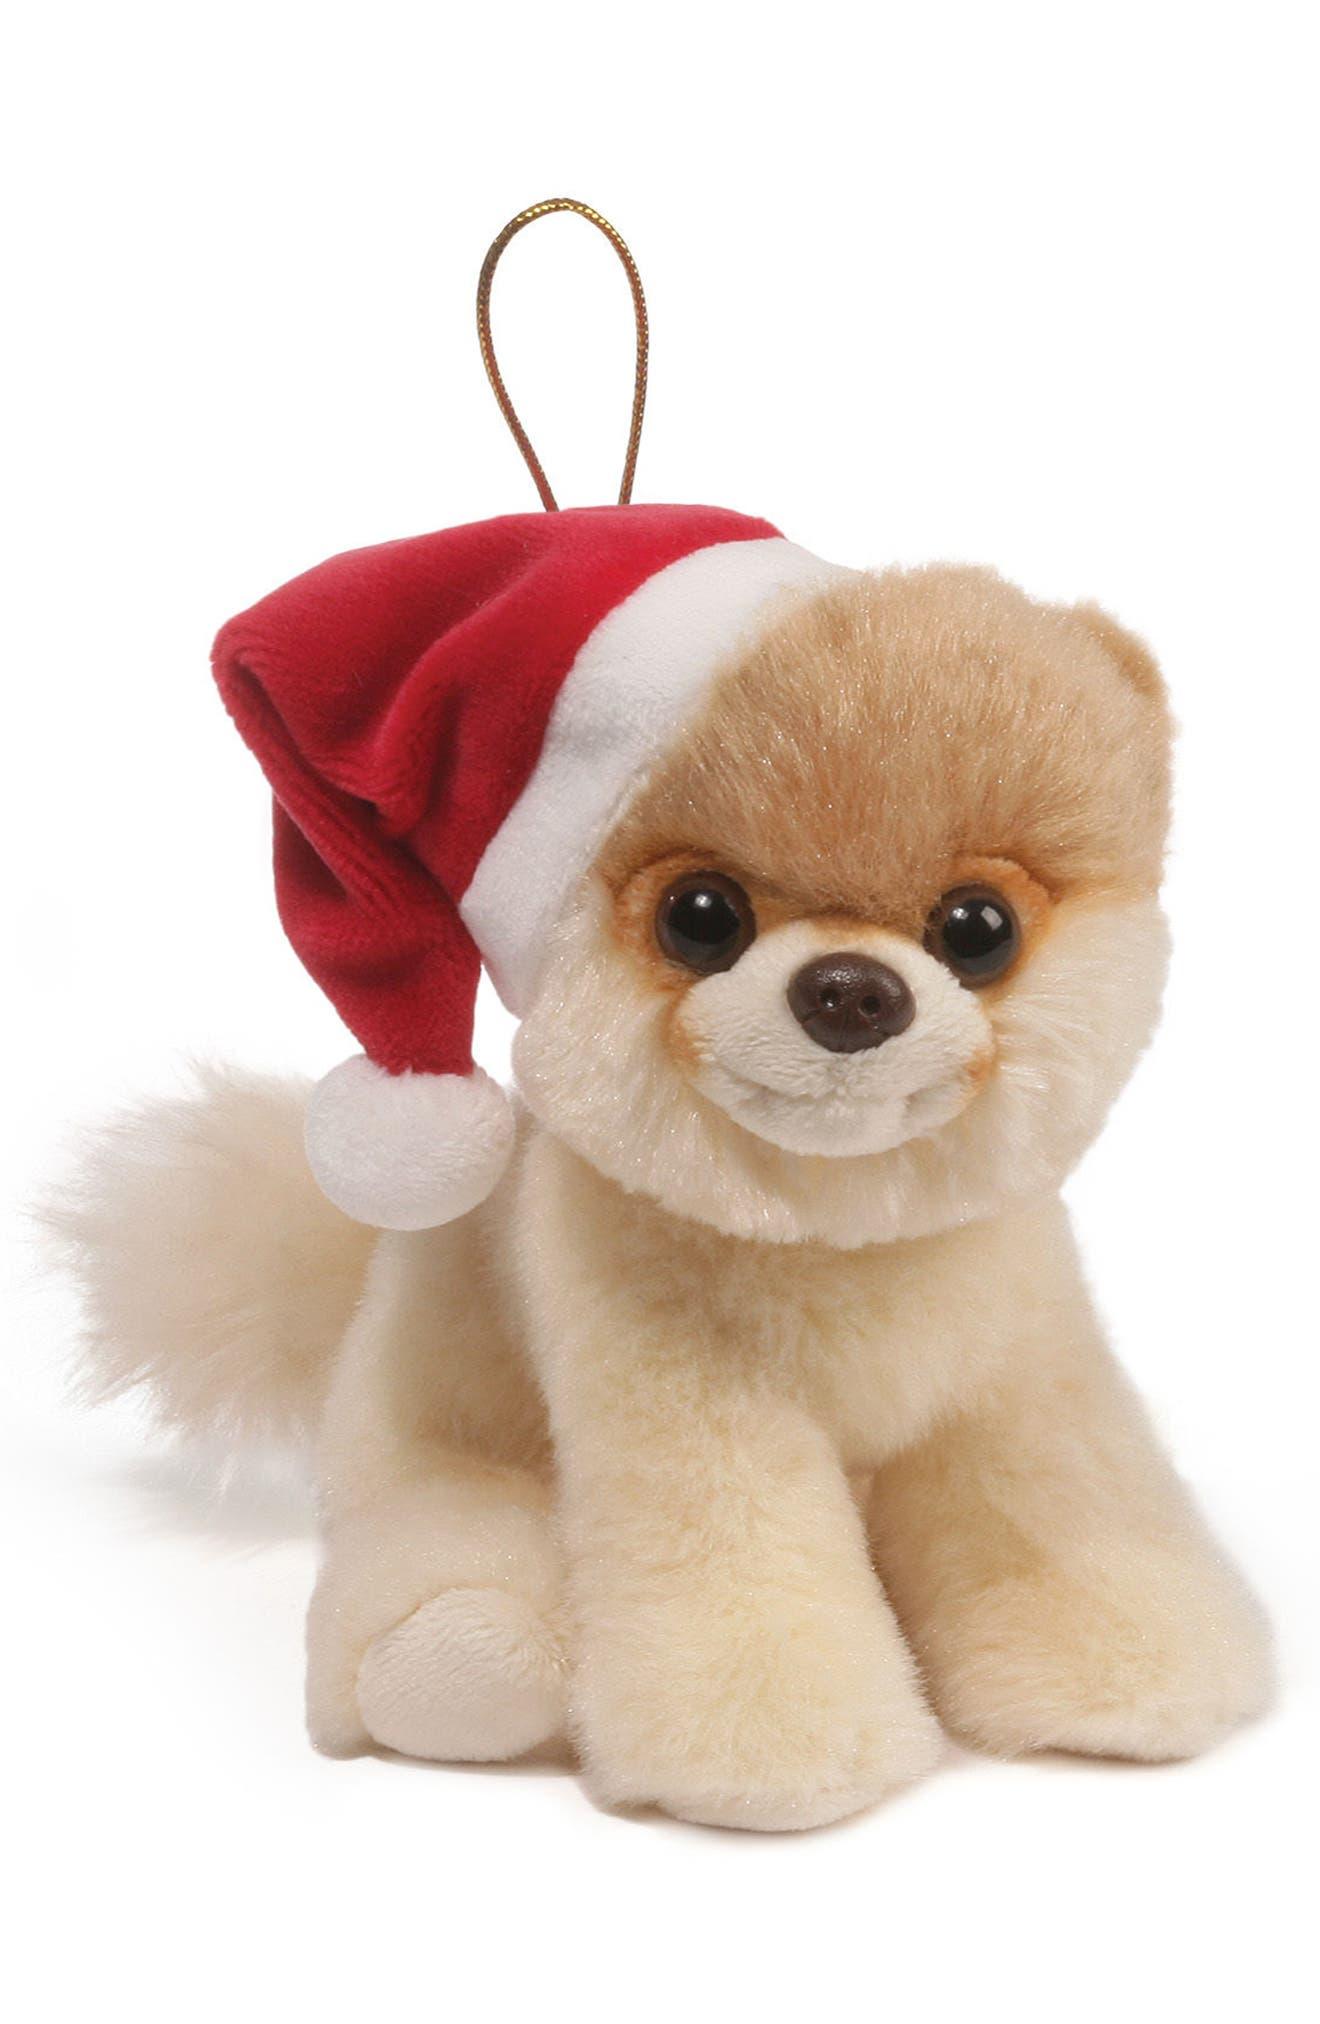 Gund Itty Bitty Boo Plush Stuffed Ornament